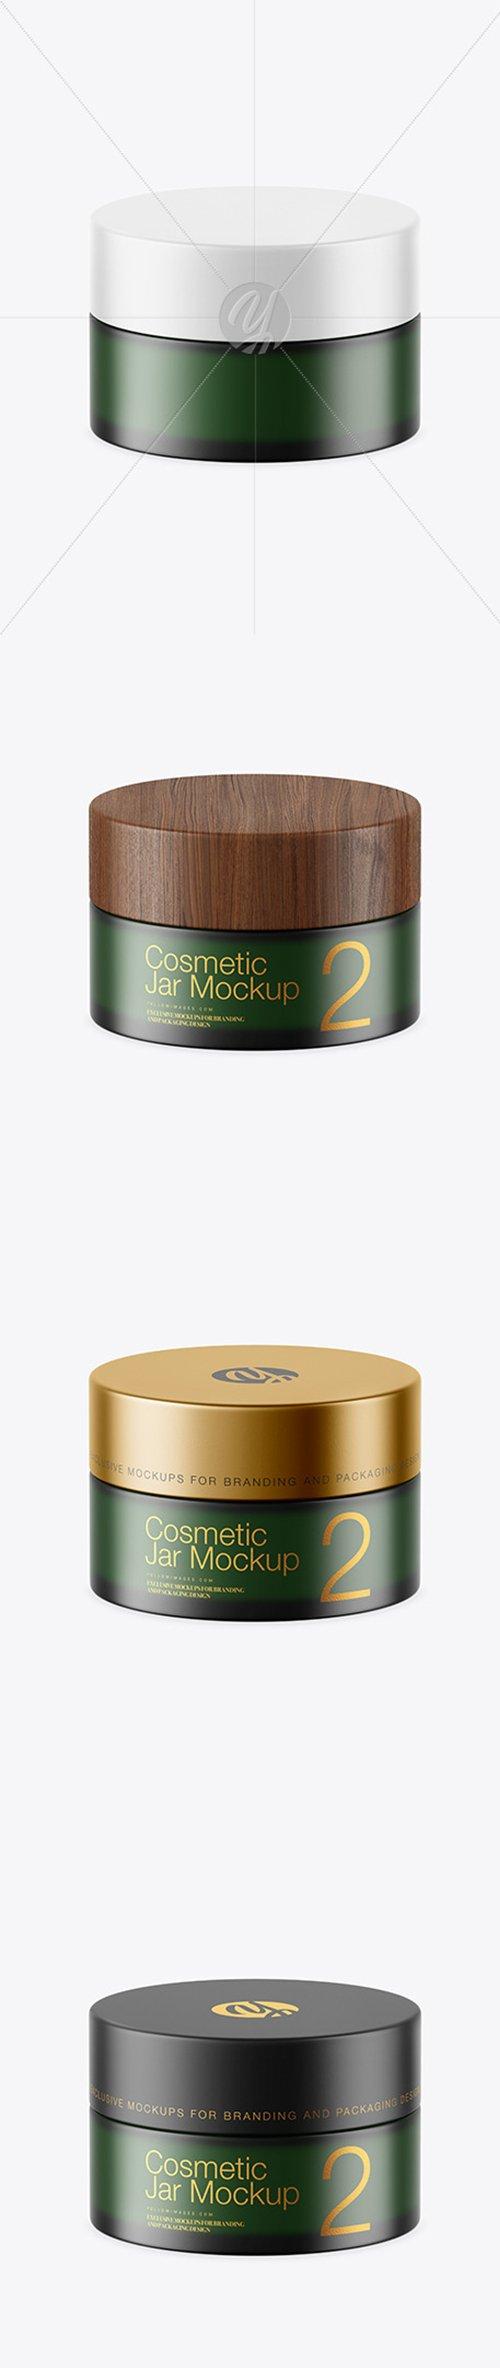 Dark Frosted Green Glass Cosmetic Jar Mockup 45163 TIF